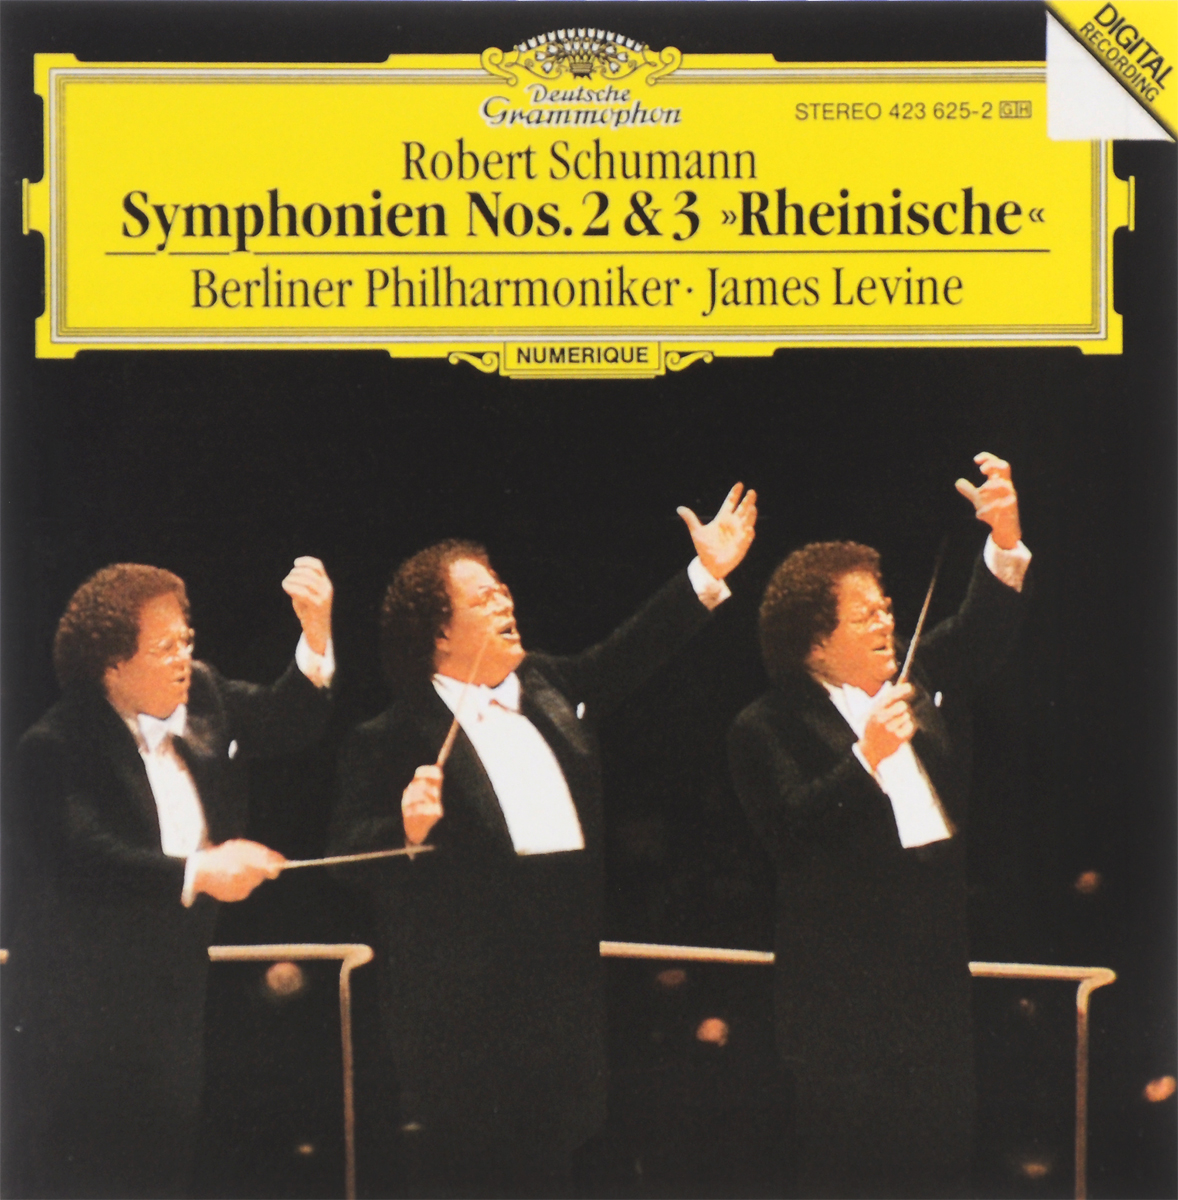 Роберт Шуман Robert Schumann. Symphonies Nos. 2 & 3 Rheinische м московский 3 арабески op 61 3 arabesques op 61